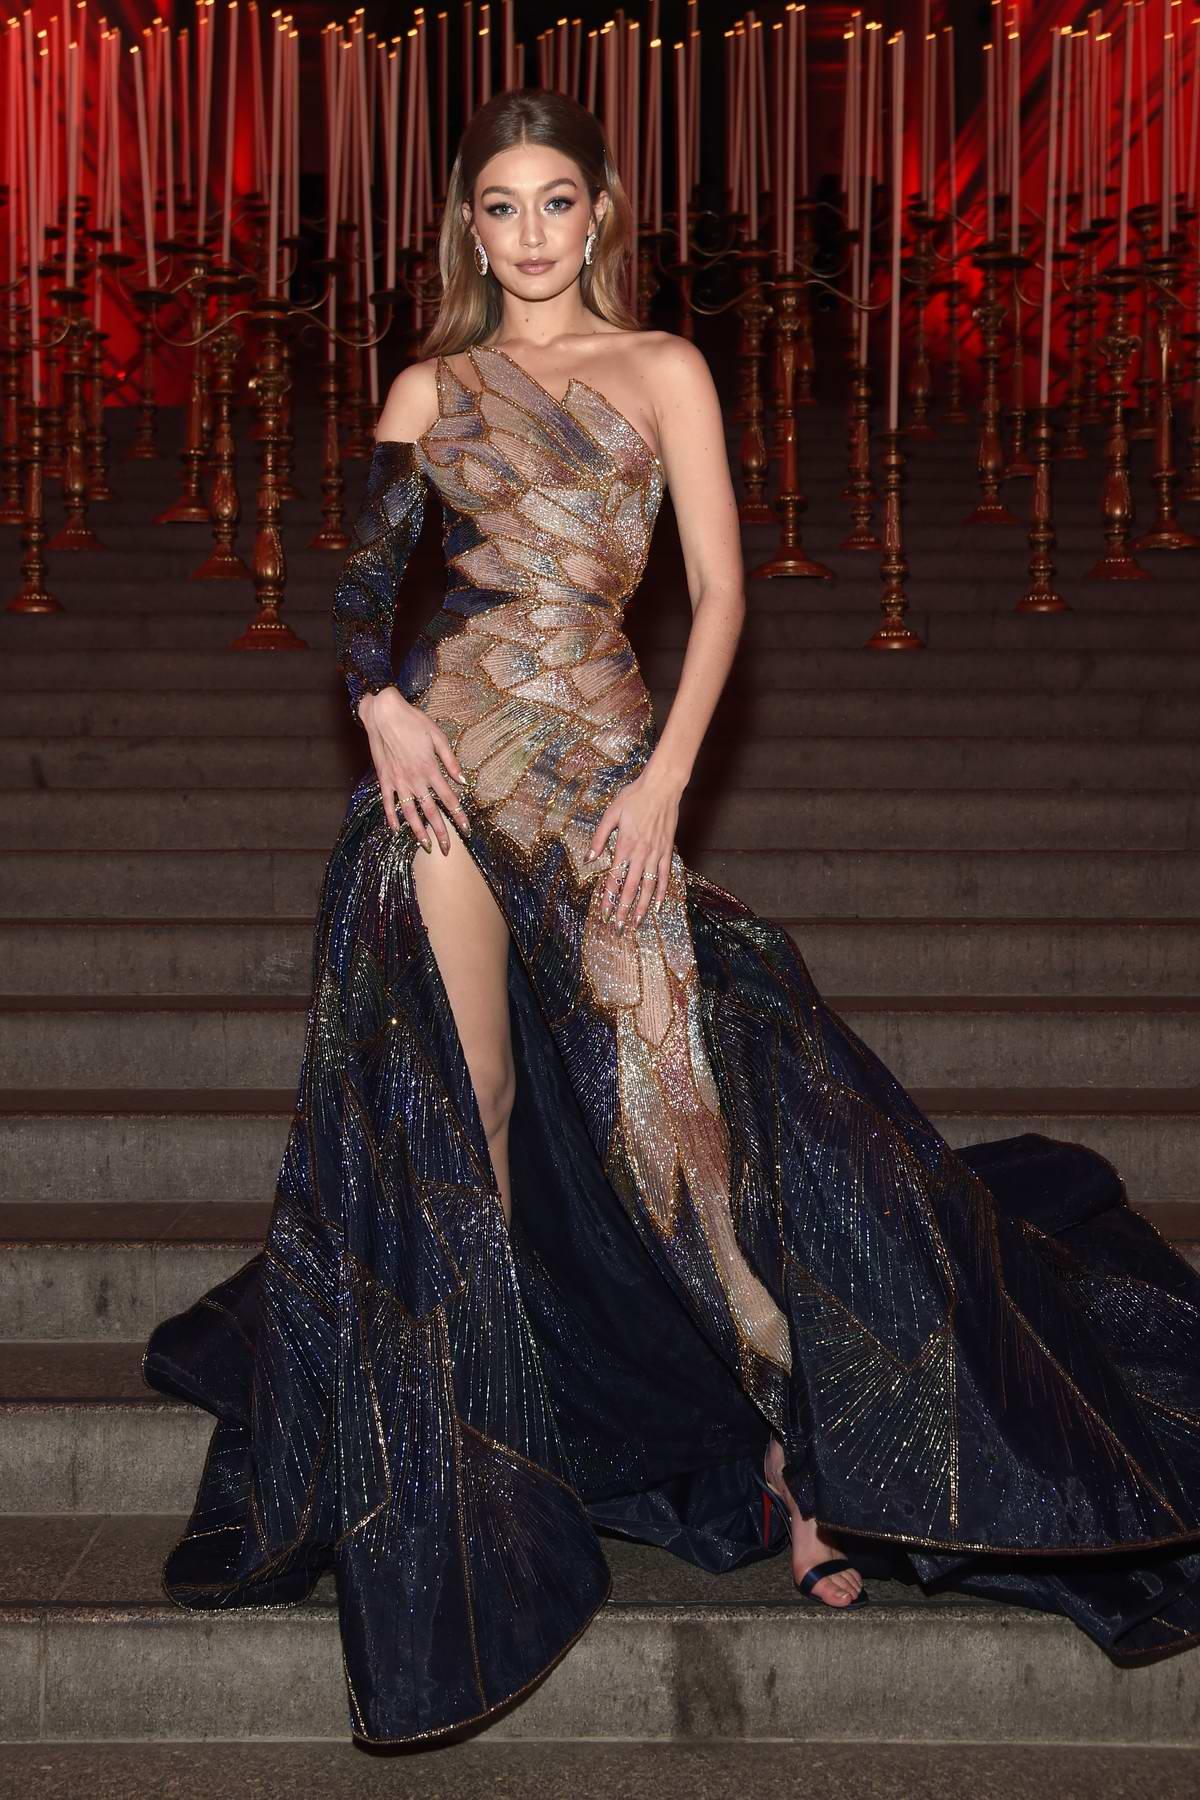 Gigi Hadid attends The Costume Institute Benefit Gala (MET Gala 2018) at Metropolitan Museum of Art in New York City